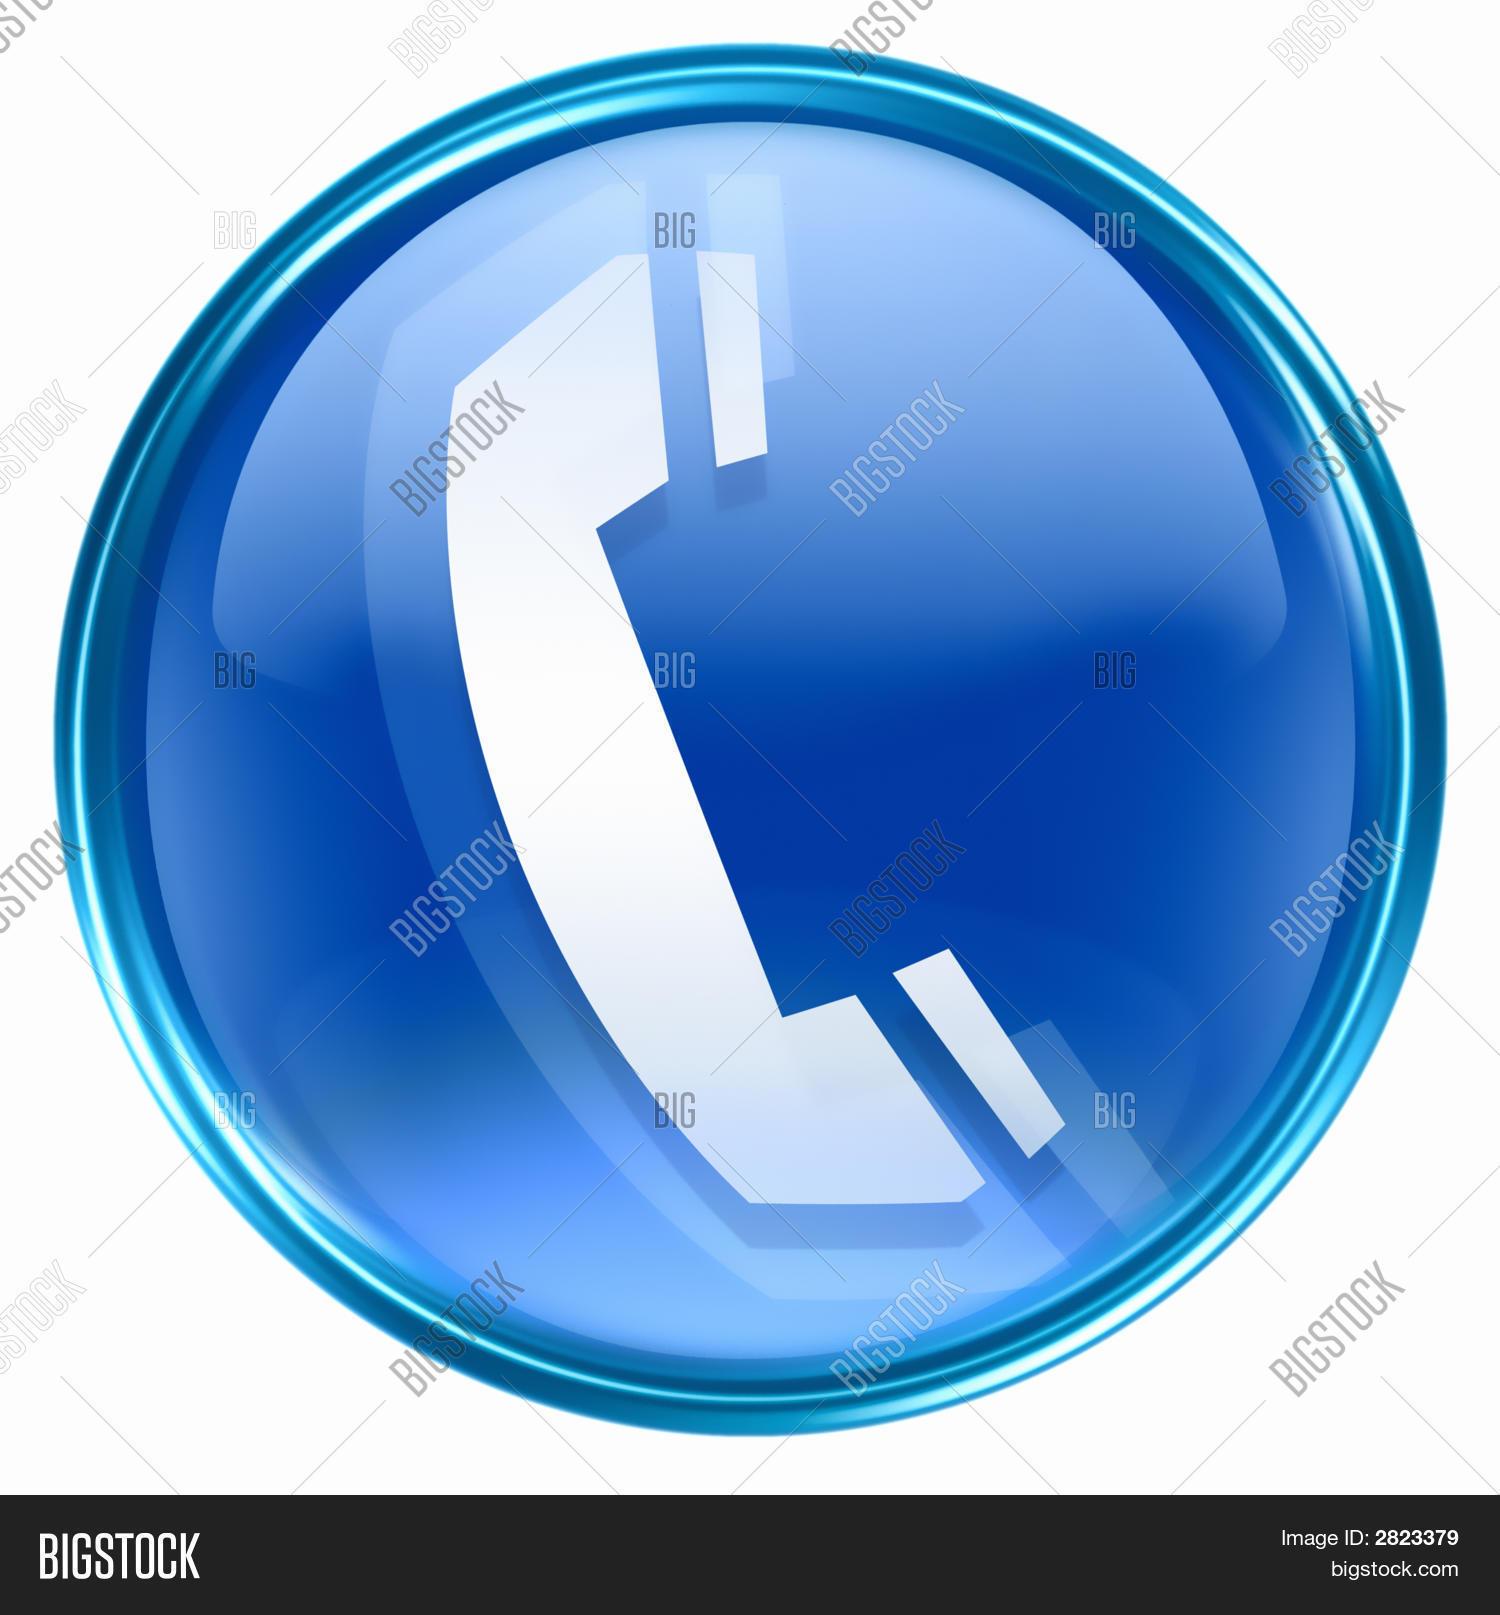 Phone Icon Blue Image & Photo (Free Trial) | Bigstock